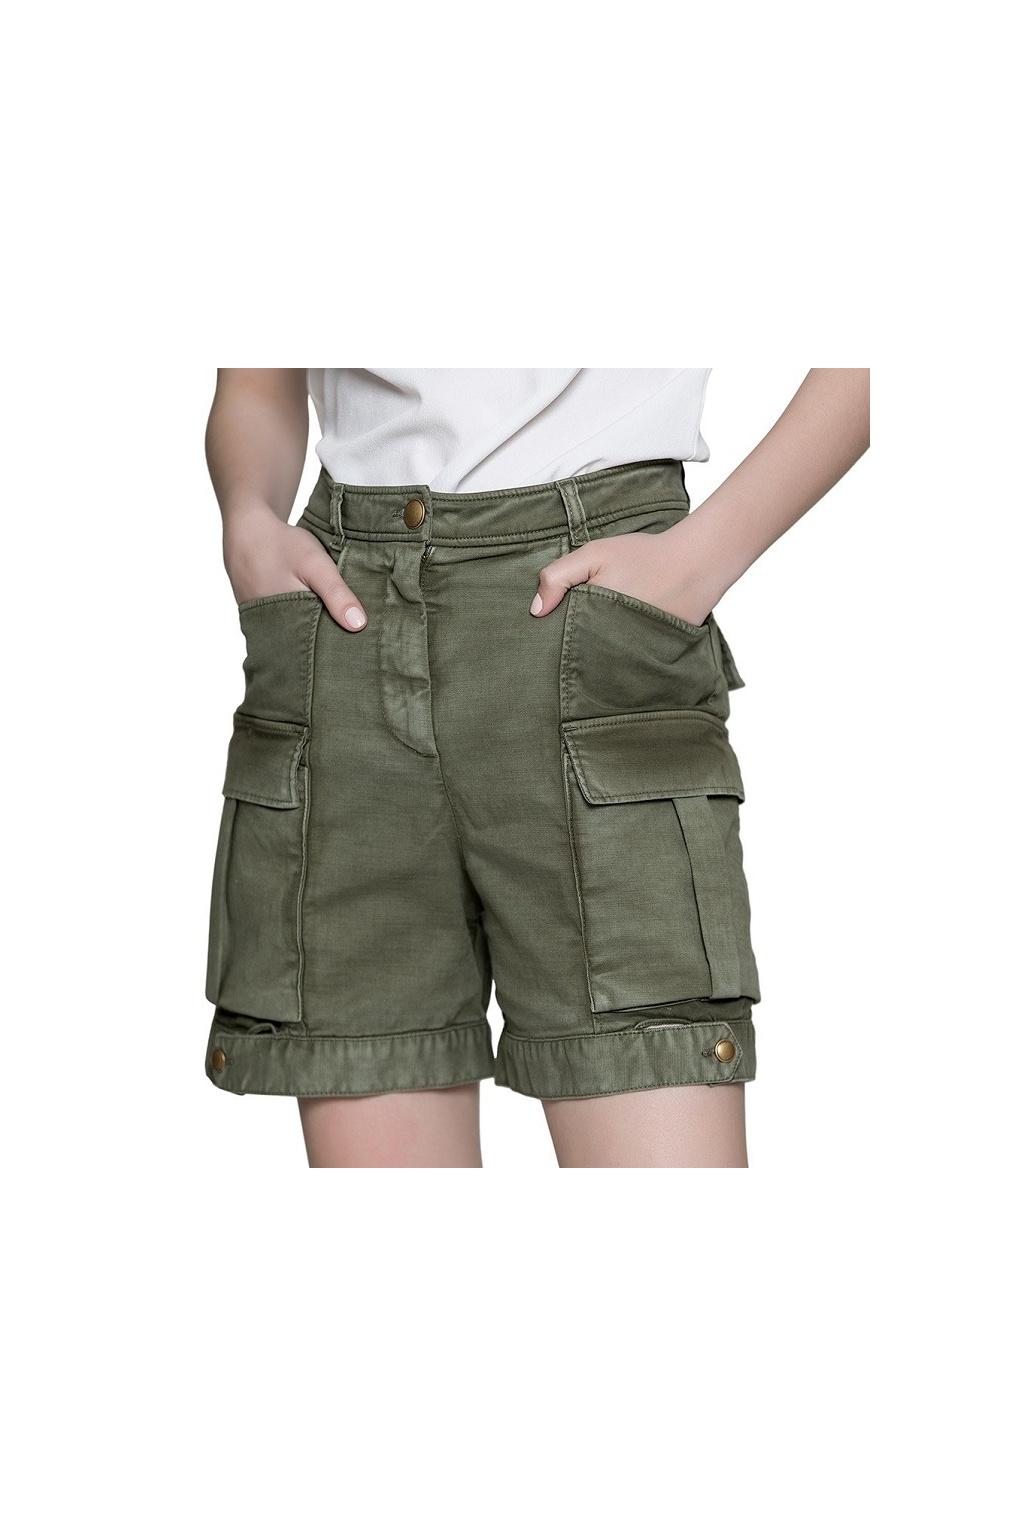 Dámské kalhoty Pinko Purificato khaki 0